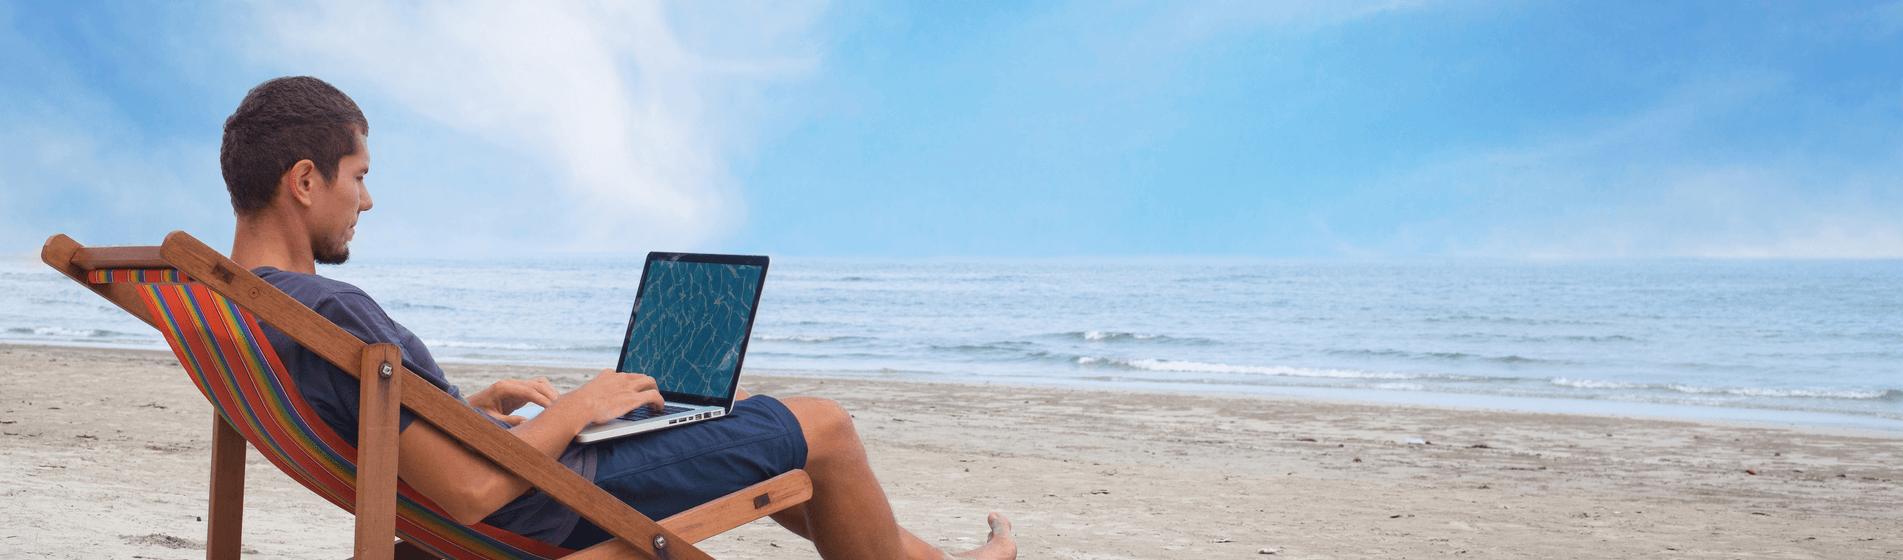 Future of digital nomads